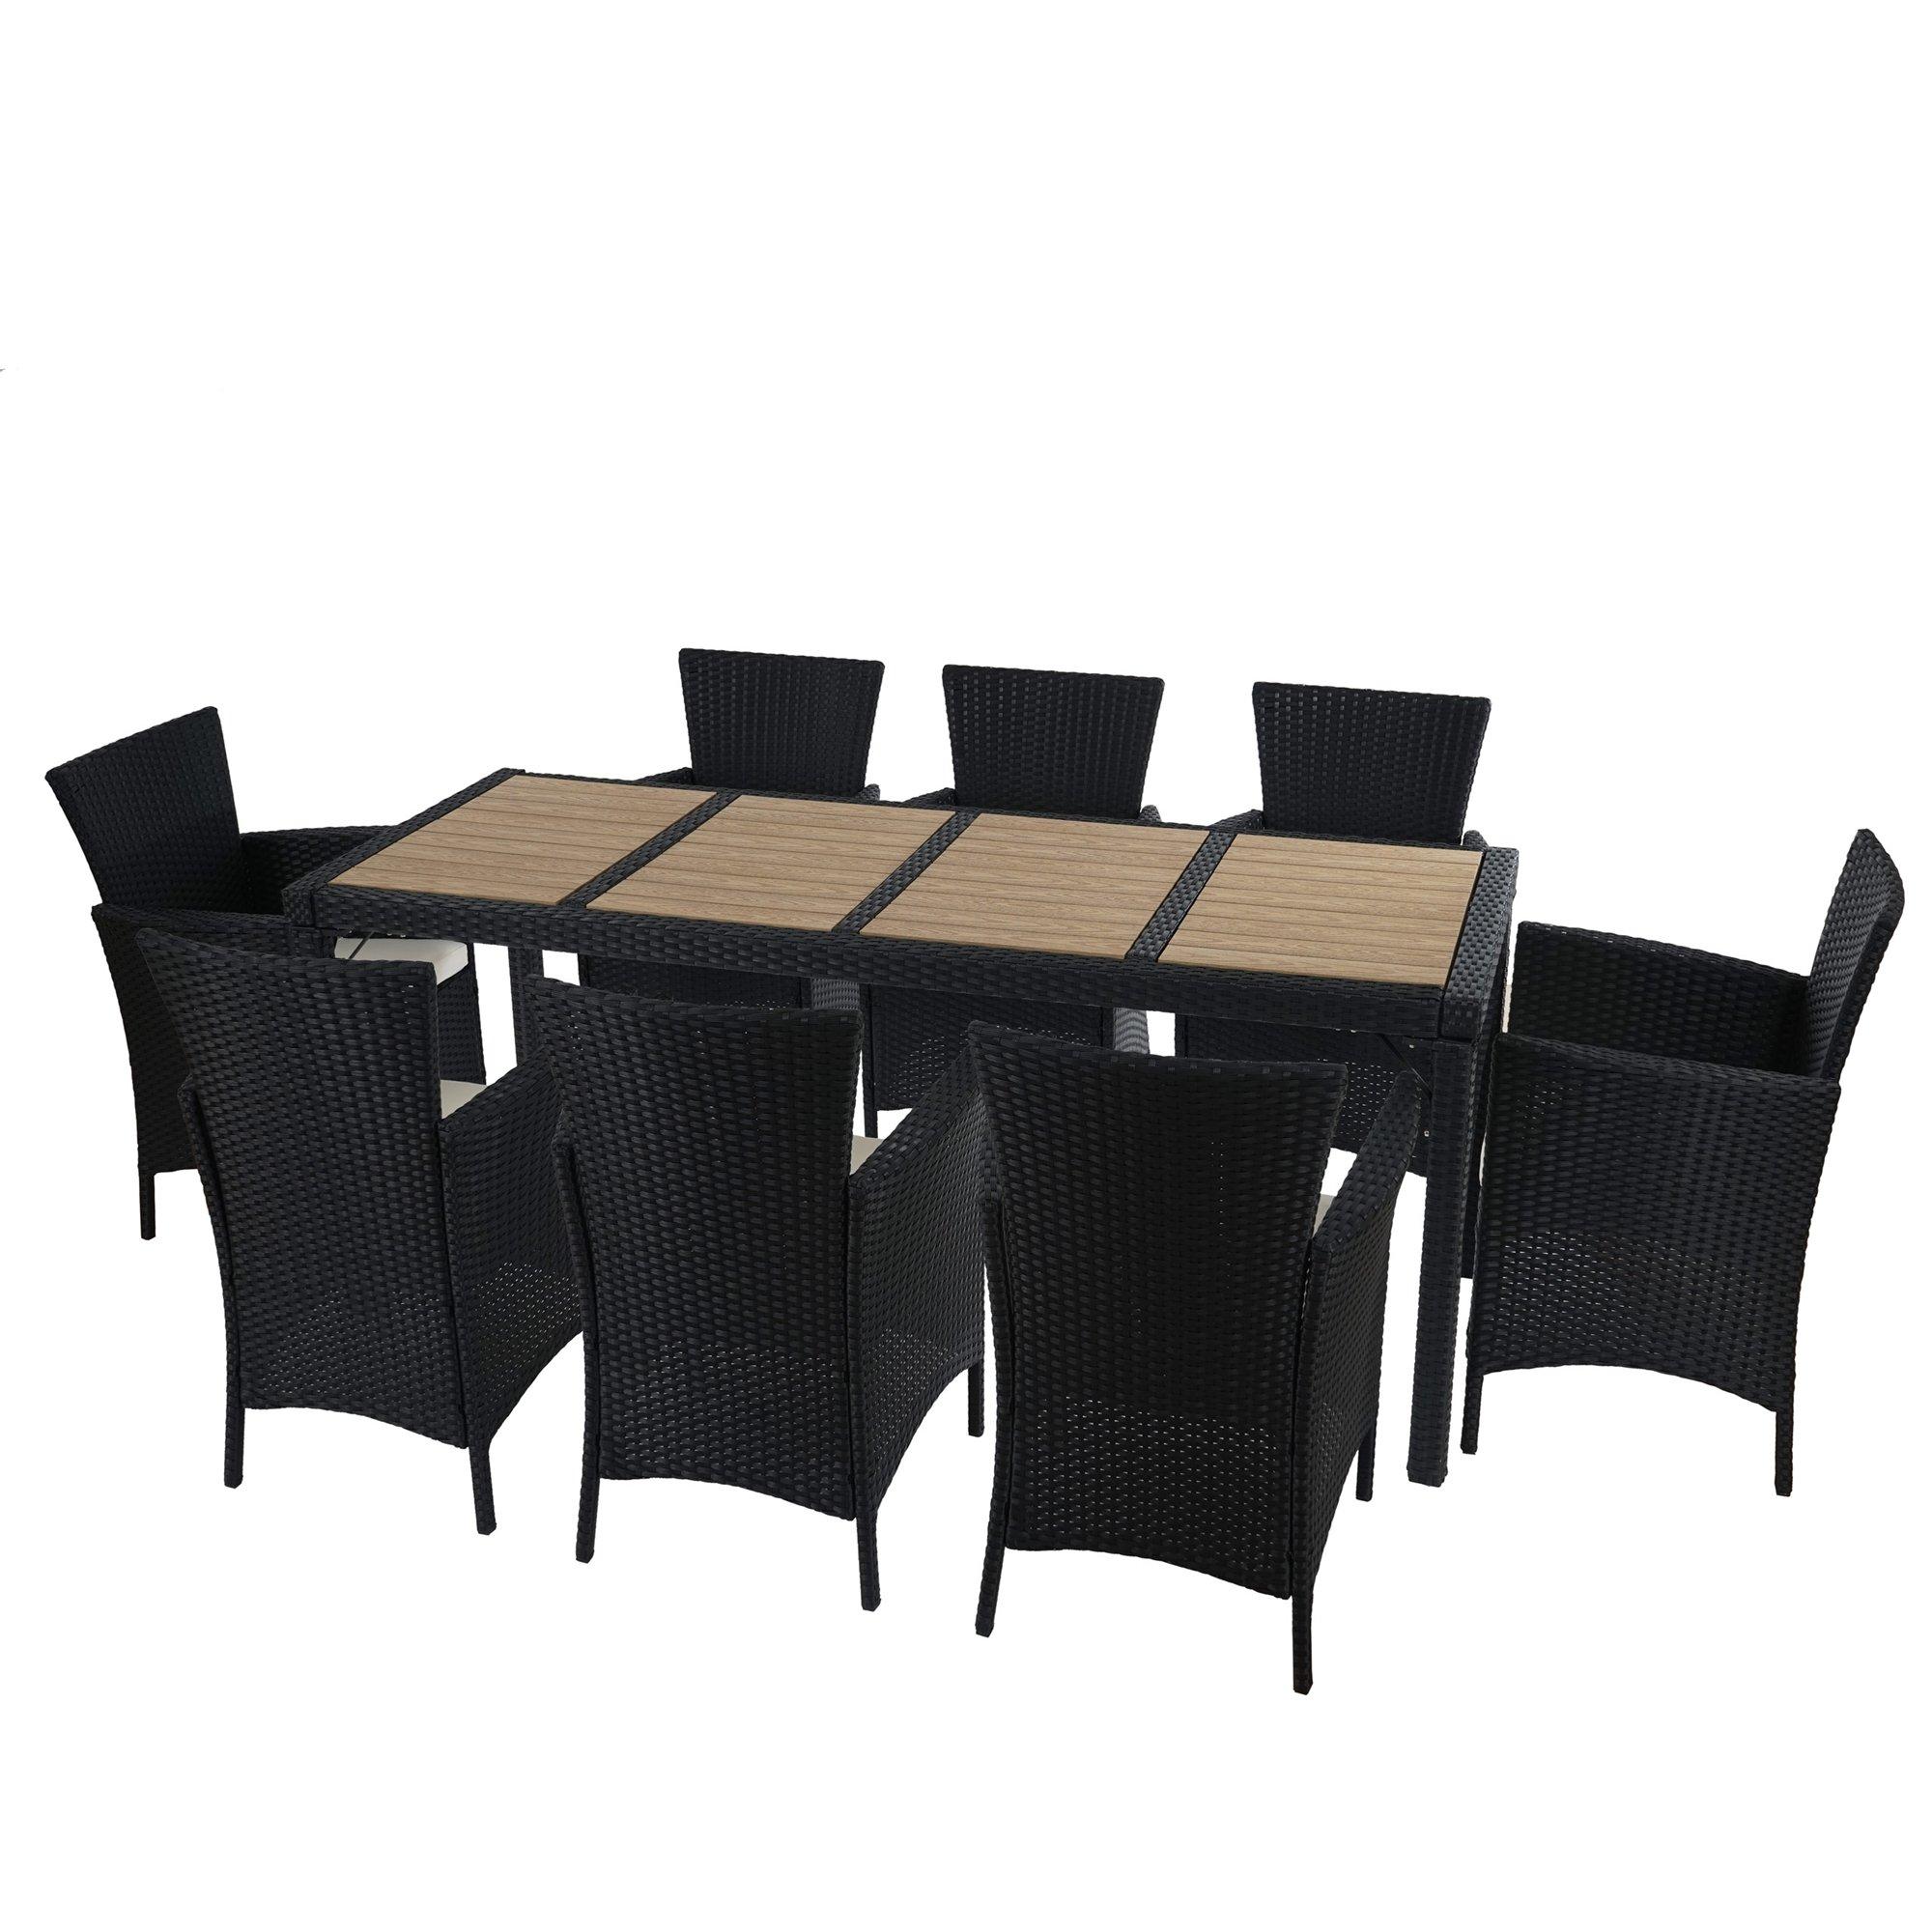 Poly muebles de jard n de rat n romv 8 sillas mesa de - Muebles de jardin de ratan ...